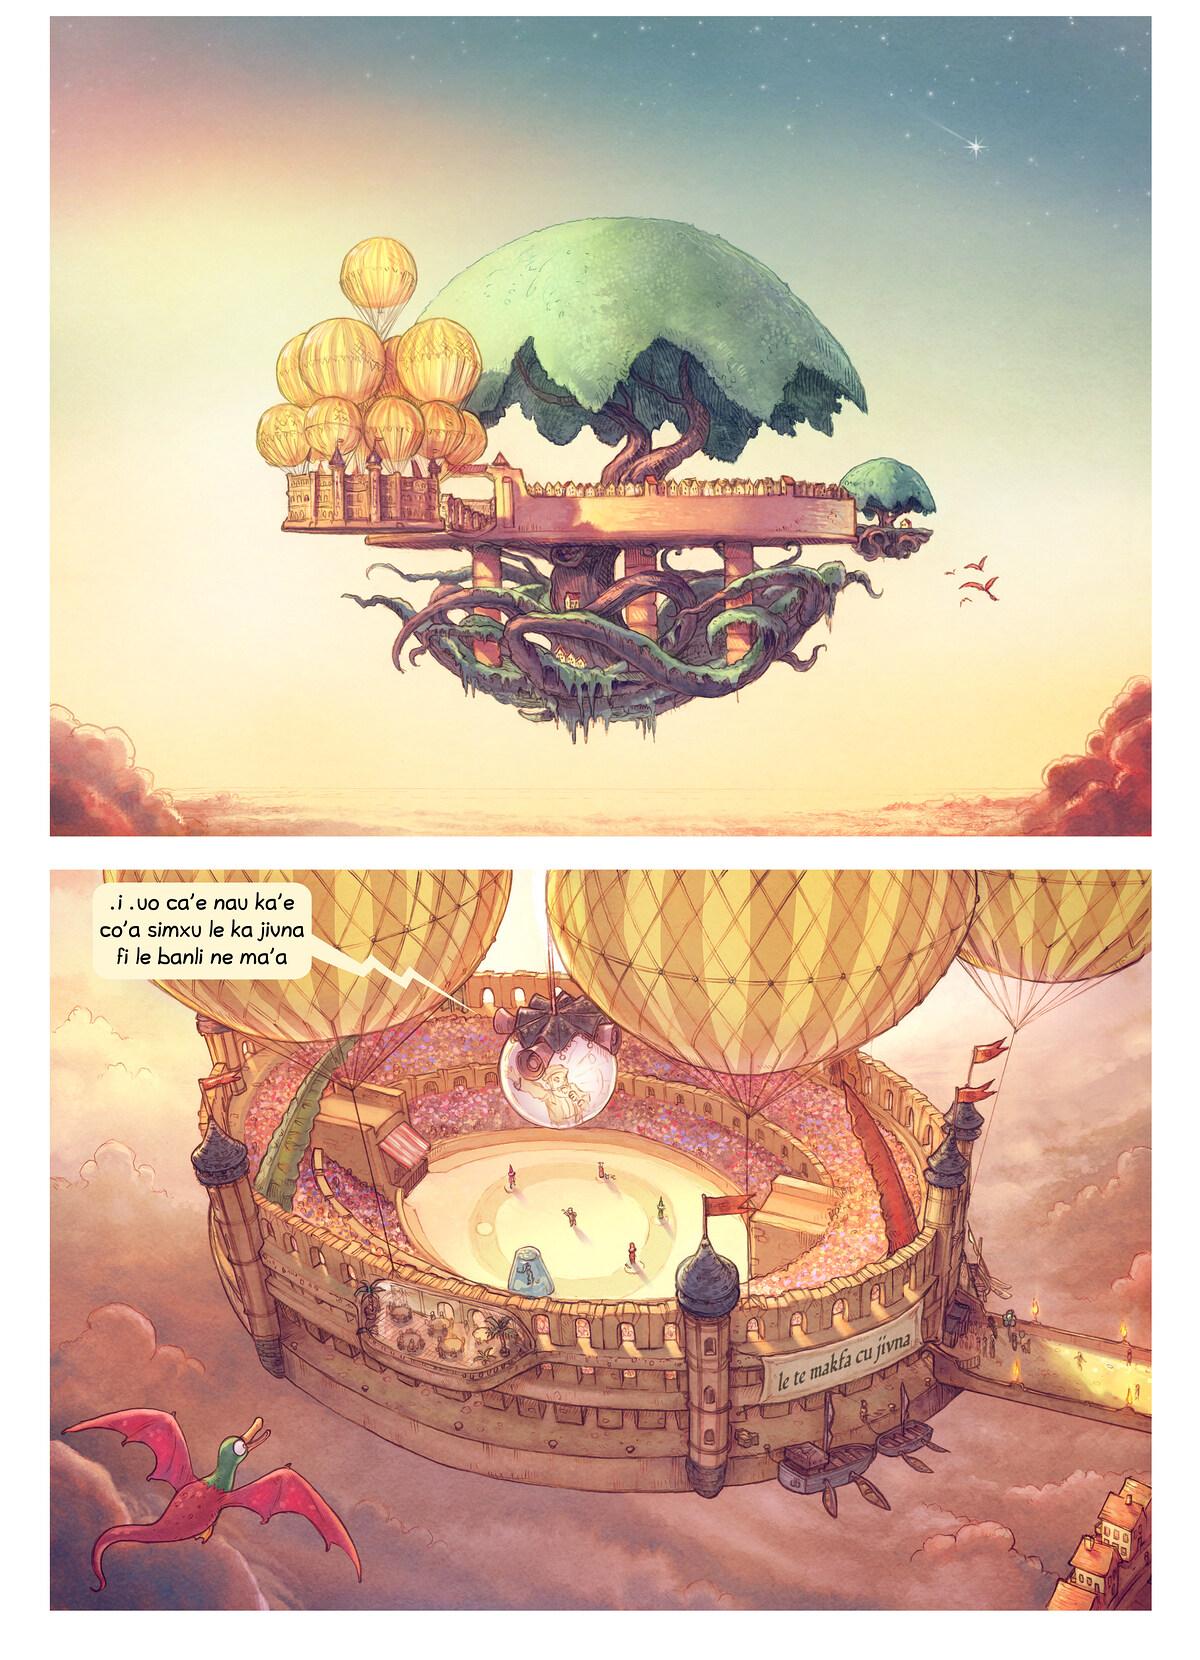 A webcomic page of Pepper&Carrot, pagbu 22 [jb], papri 1